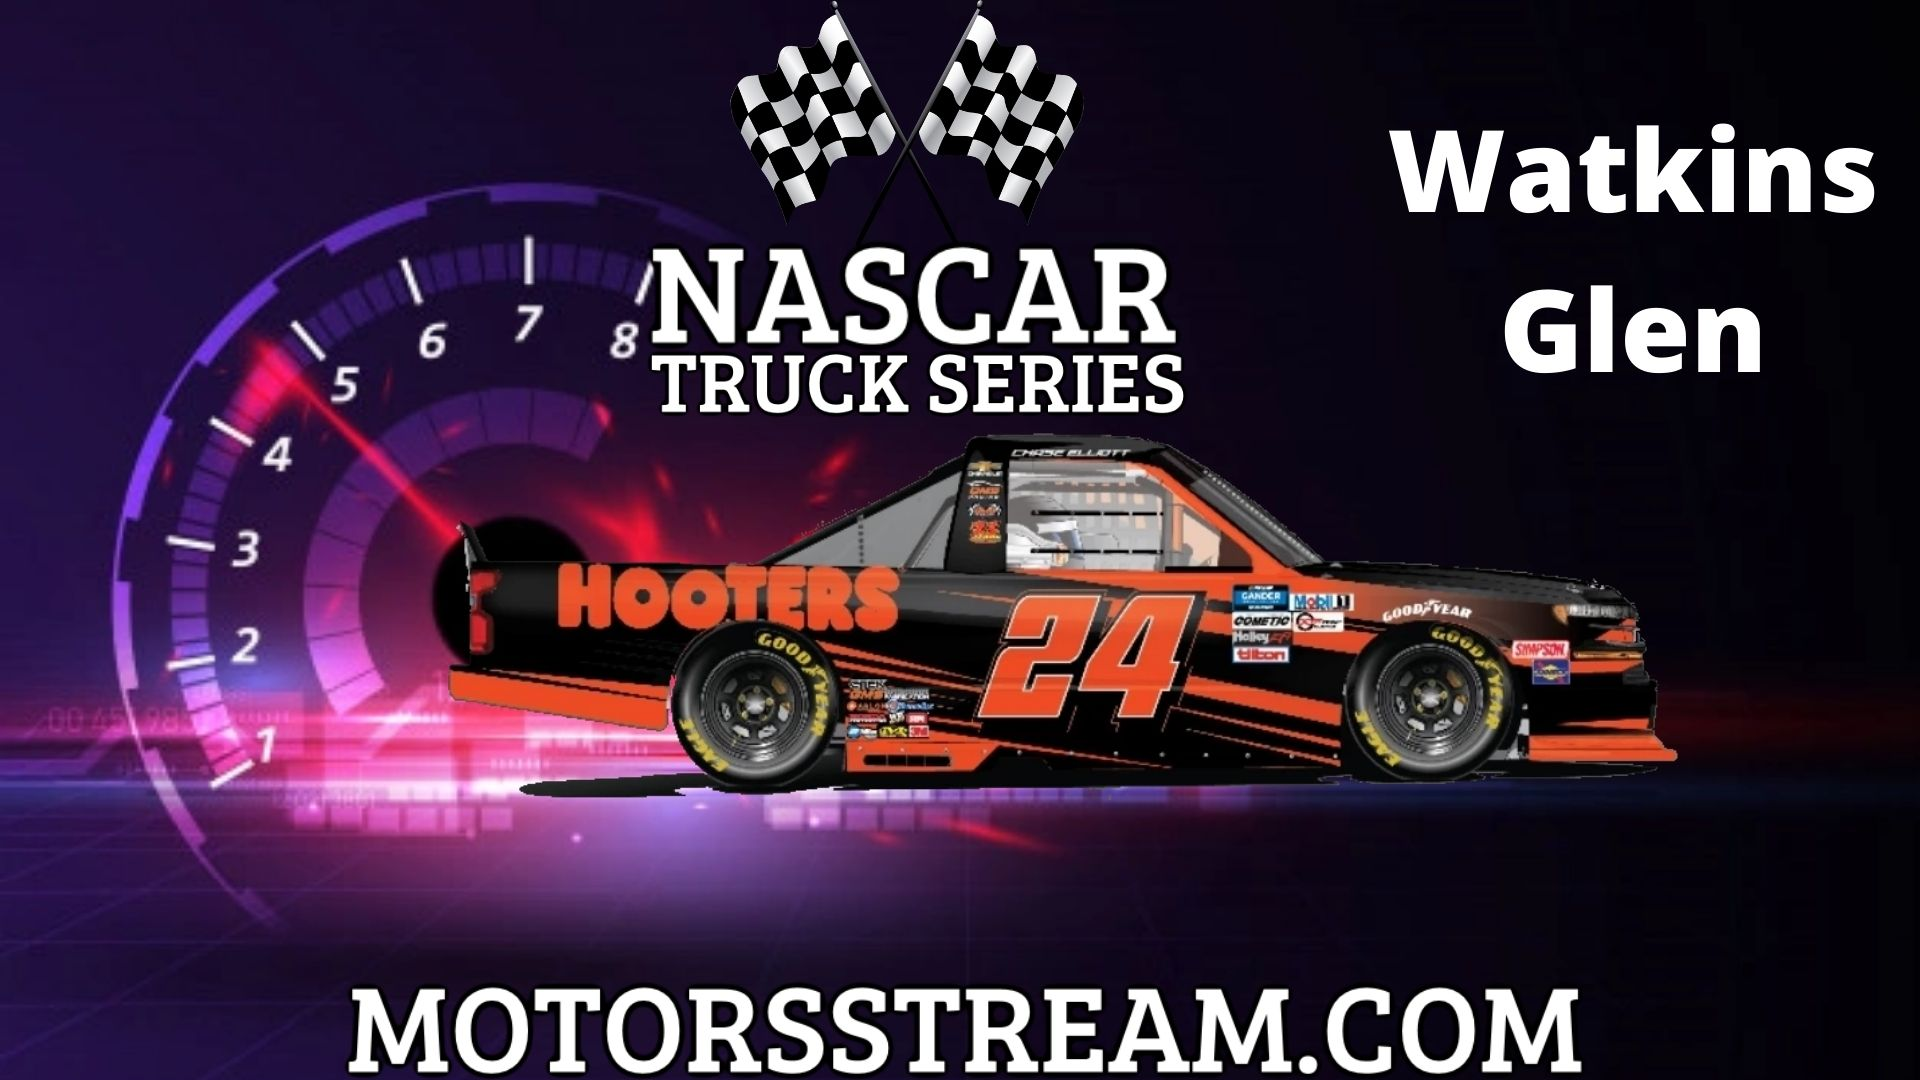 NASCAR Truck Series at The Glen Live Stream